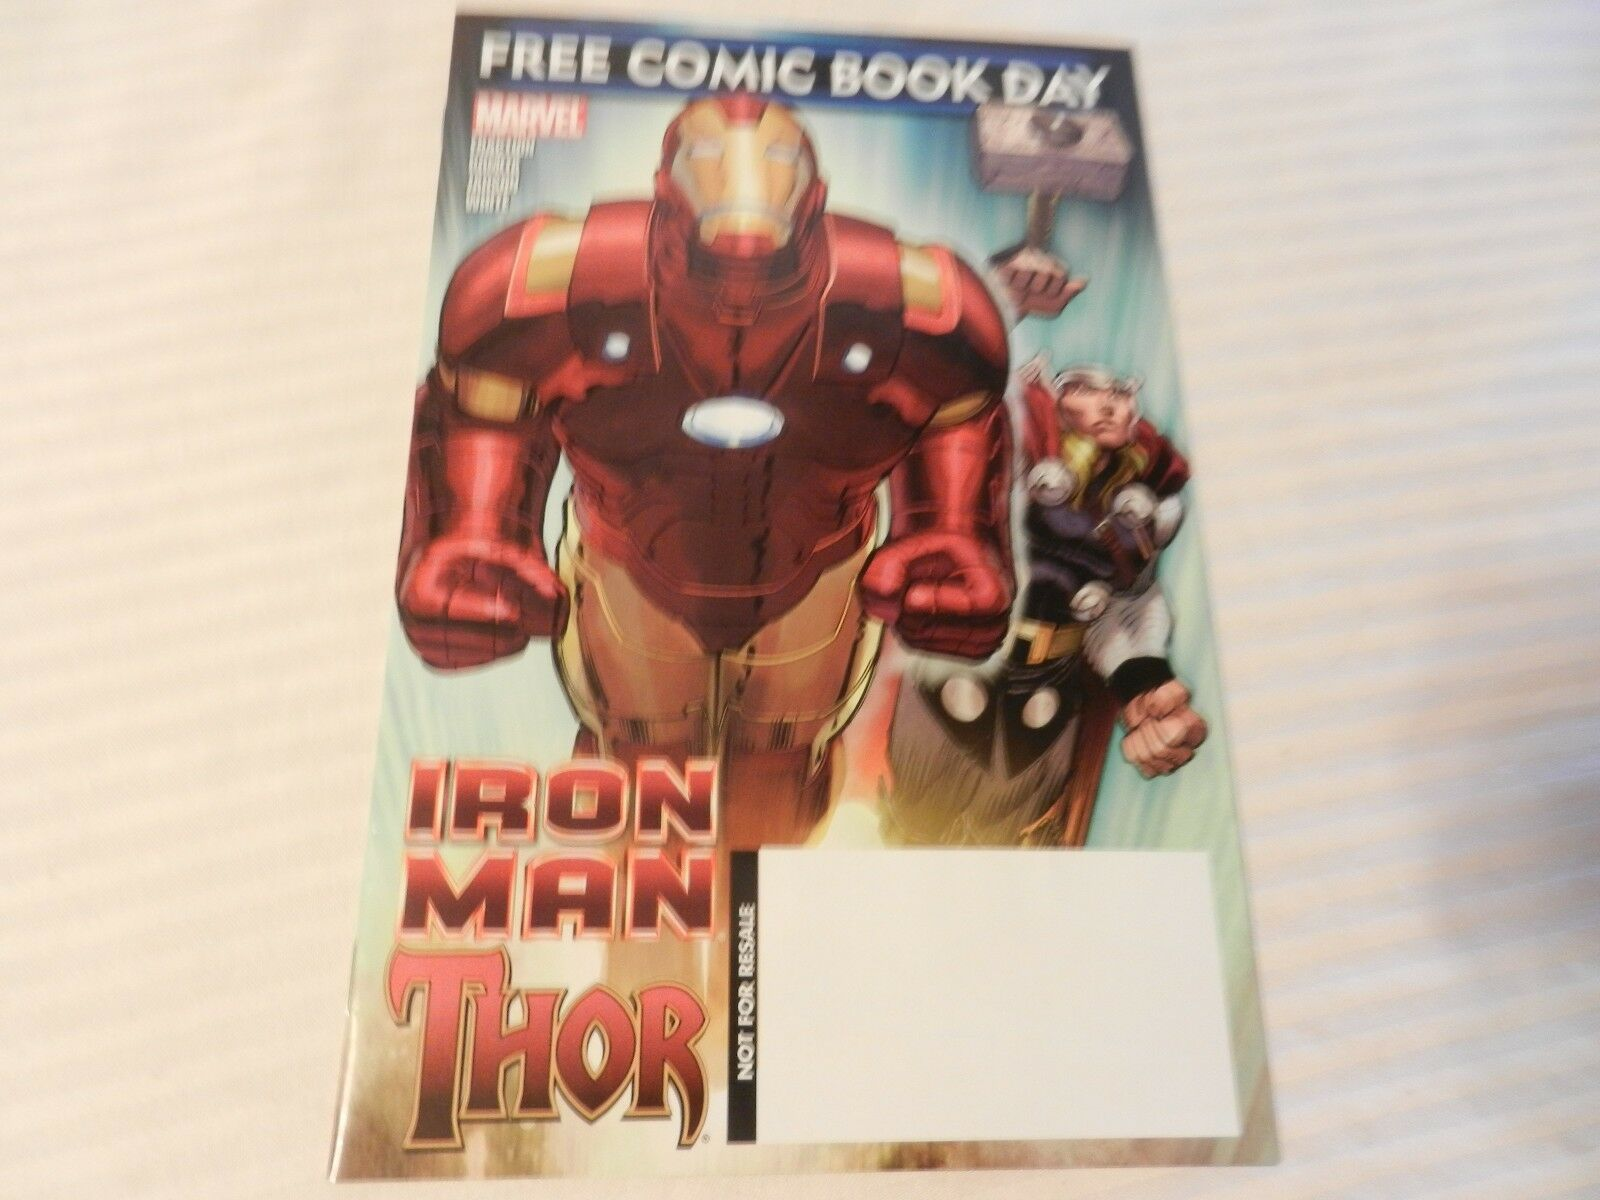 Iron Man & Thor Marvel Comics #1 May 2010 Comic Book Day